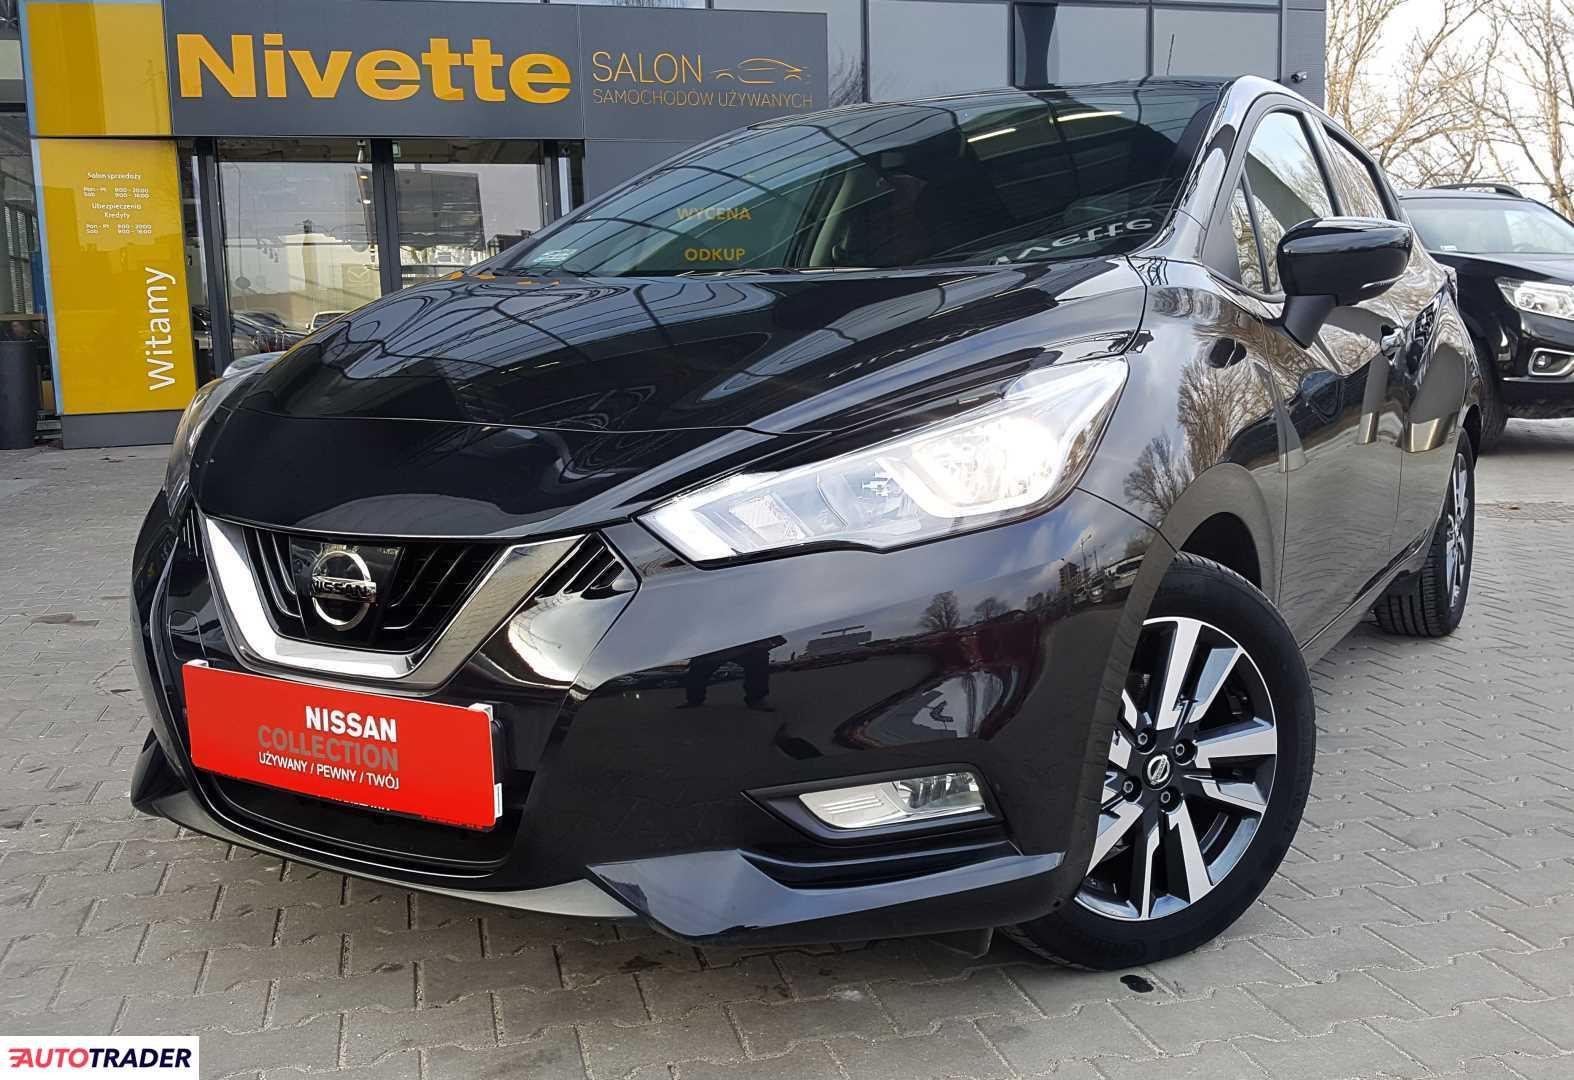 Nissan Micra 2017 0.9 90 KM